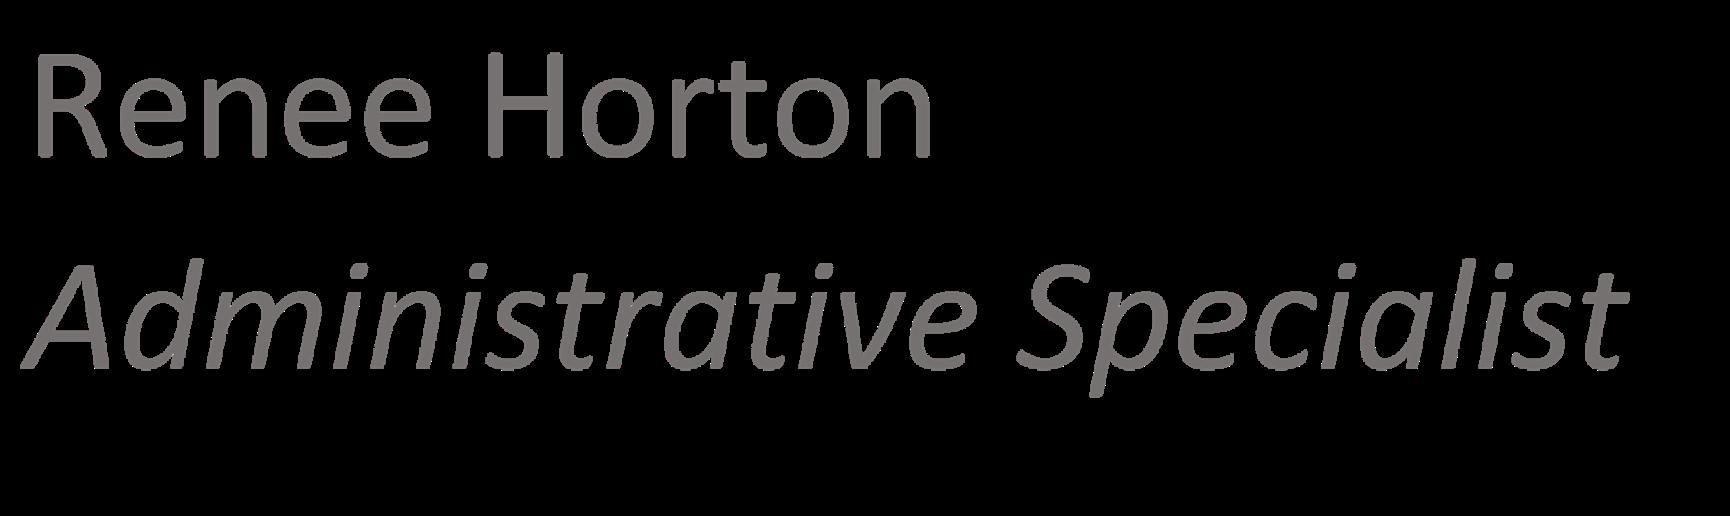 Renee Horton, Administrative Specialist